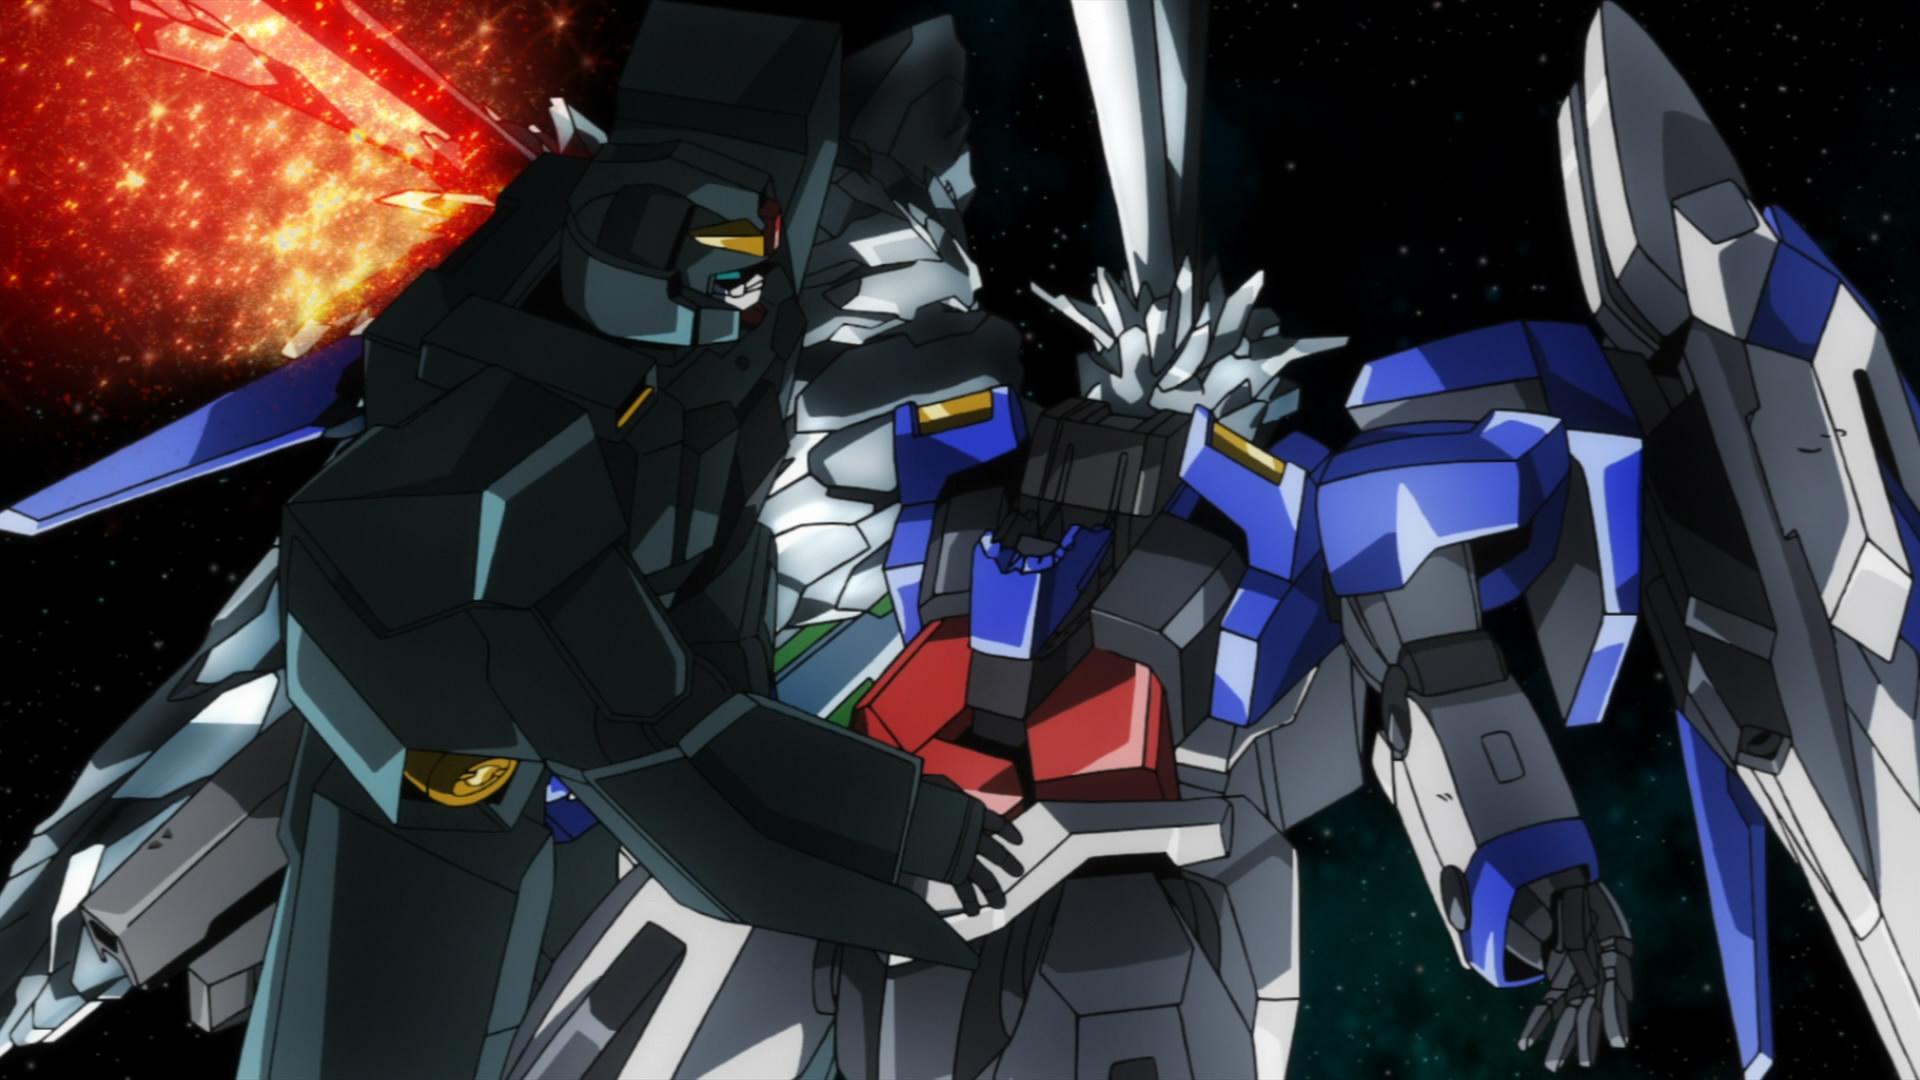 [gSS]_Mobile_Suit_Gundam_00_-_A_wakening_of_the_Trailblazer_(1080p)_[2B252856].mkv_snapshot_01.10.46_[2011.01.07_04.39.57]